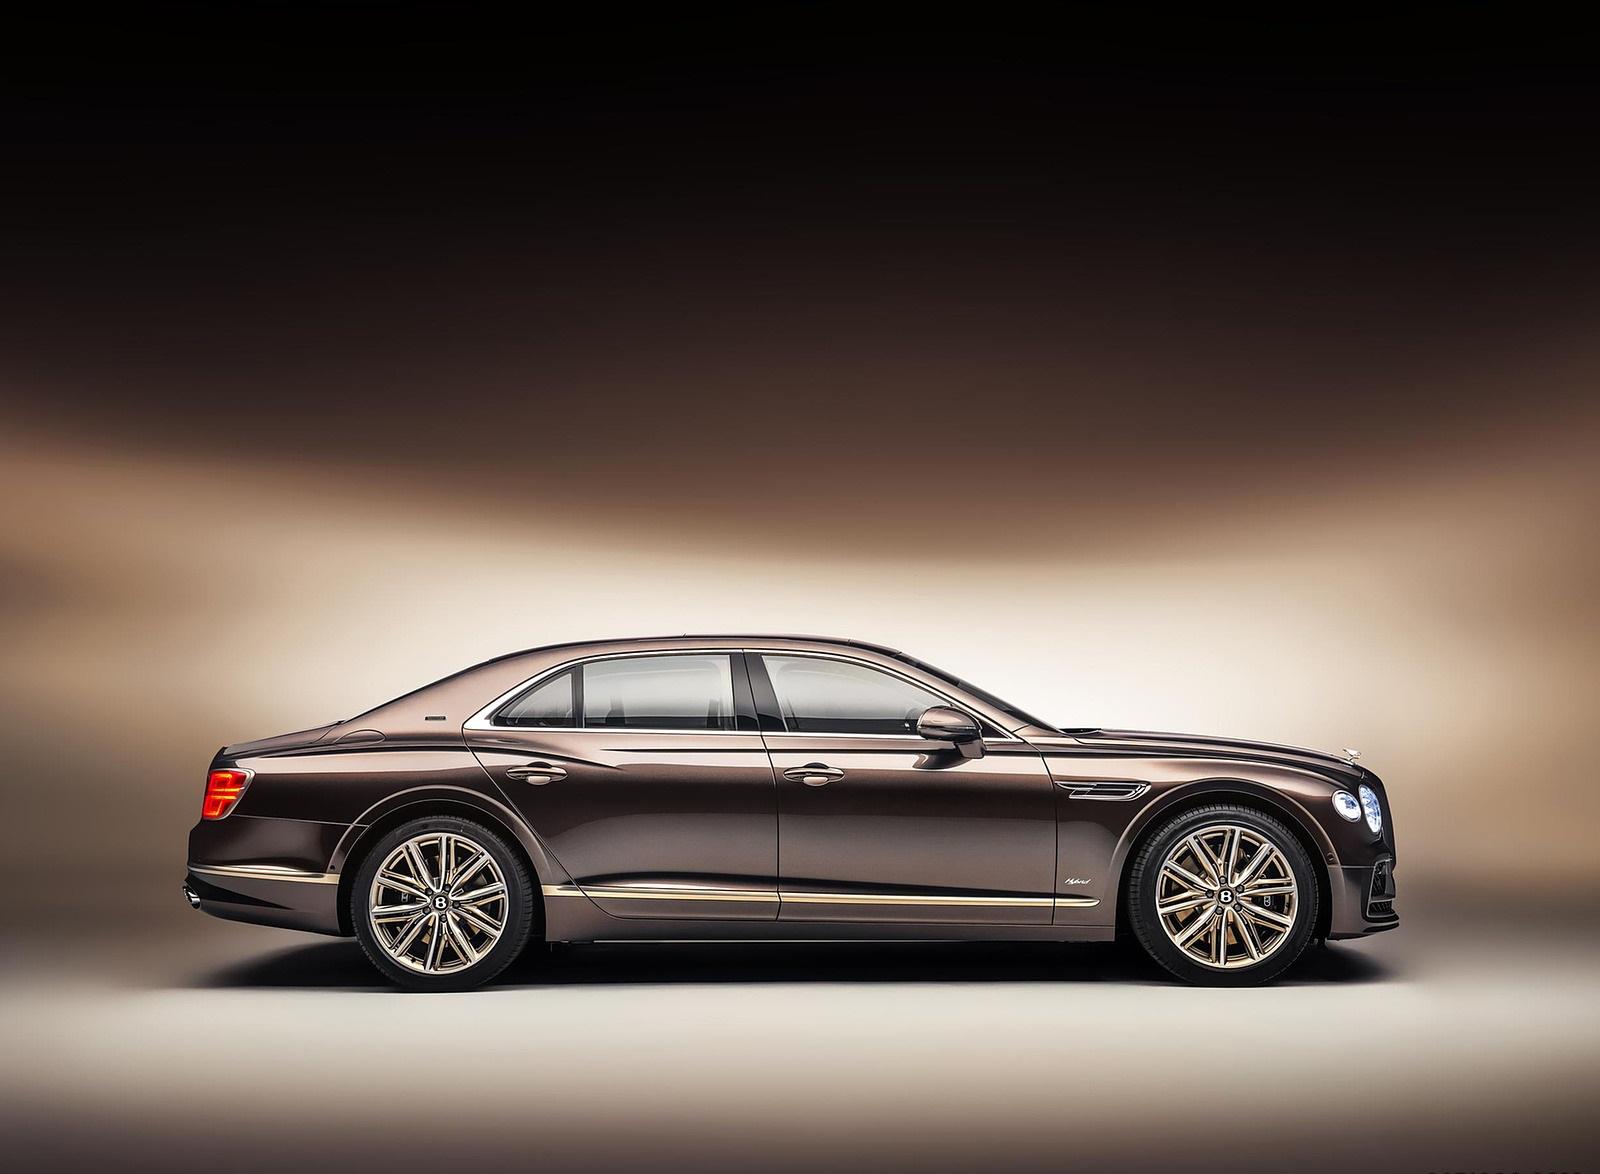 2022 Bentley Flying Spur Hybrid Odyssean Edition Side Wallpapers (3)